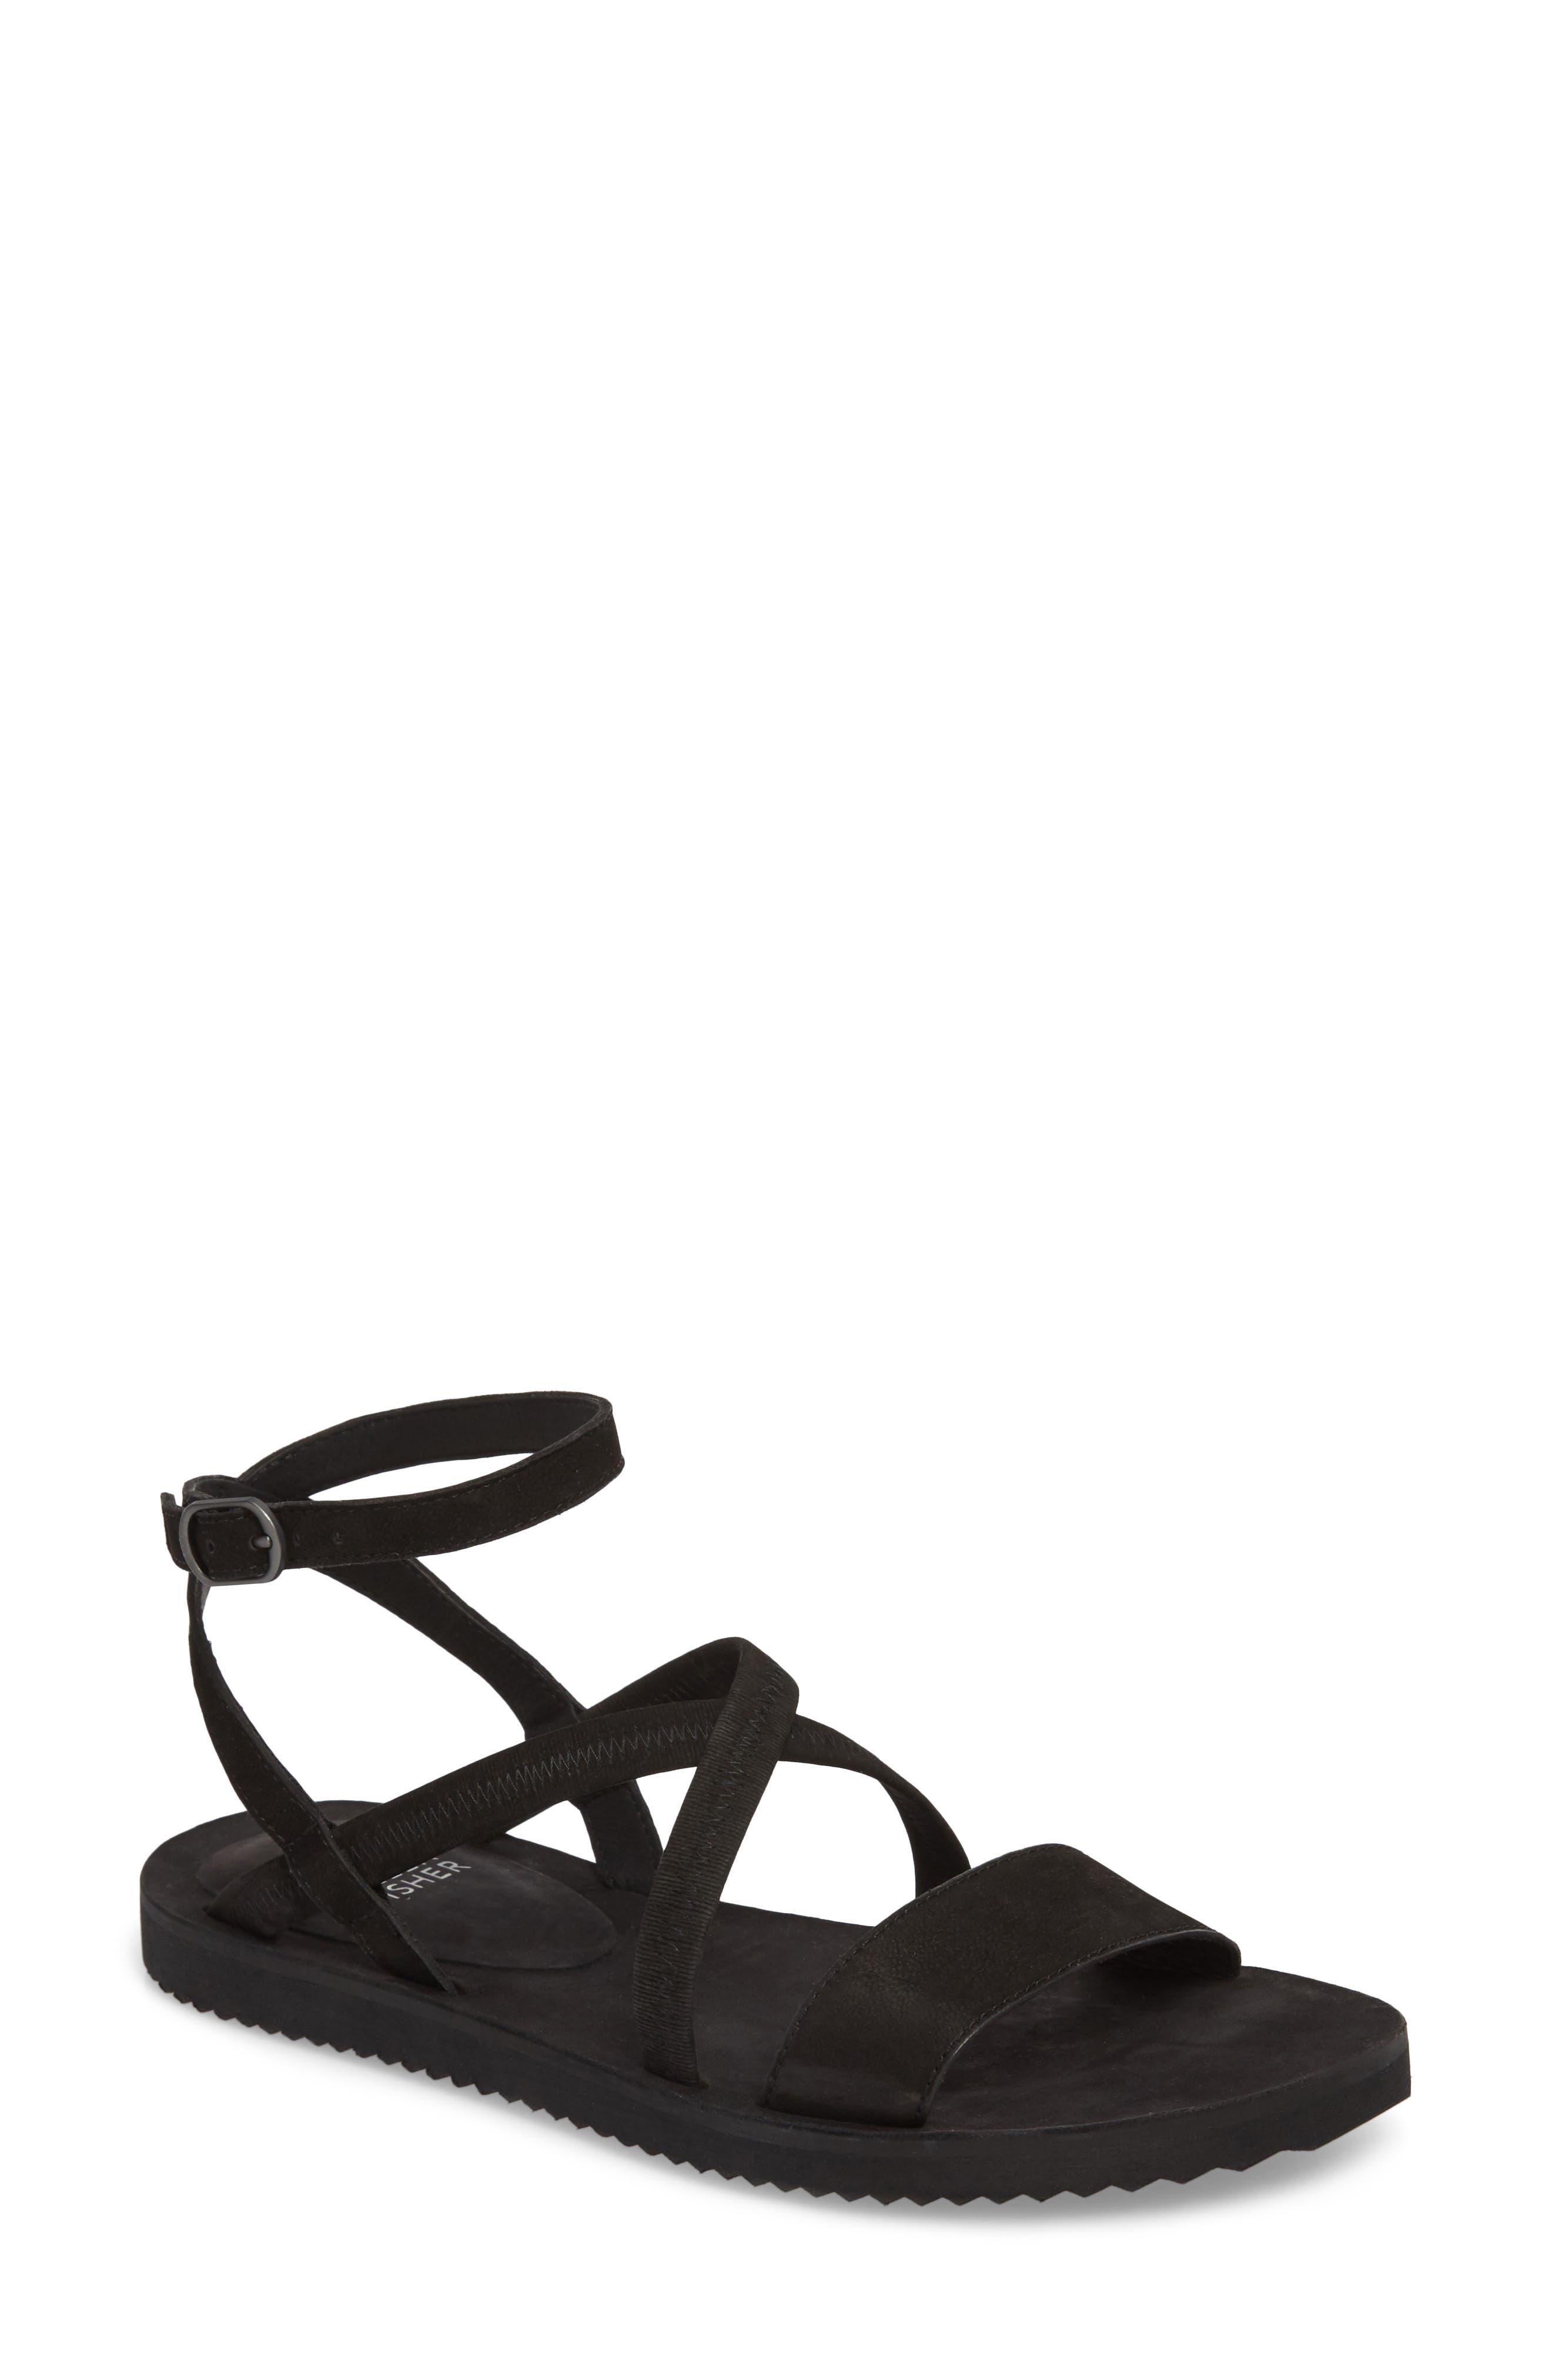 June Sandal,                         Main,                         color, BLACK NUBUCK